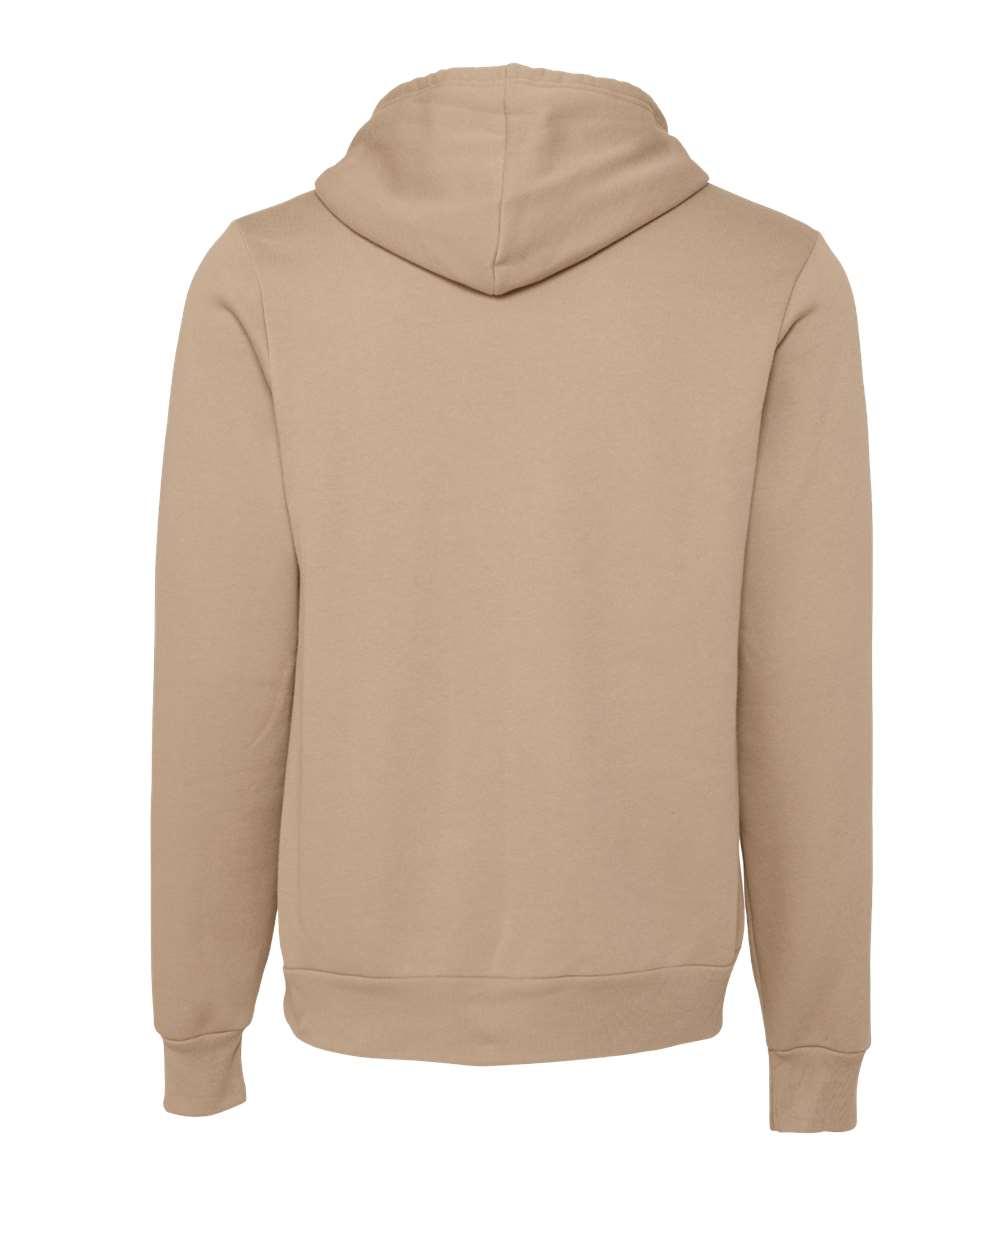 Bella-Canvas-Unisex-Sponge-Hooded-Pullover-Sweatshirt-Blank-3719-up-to-2XL thumbnail 91